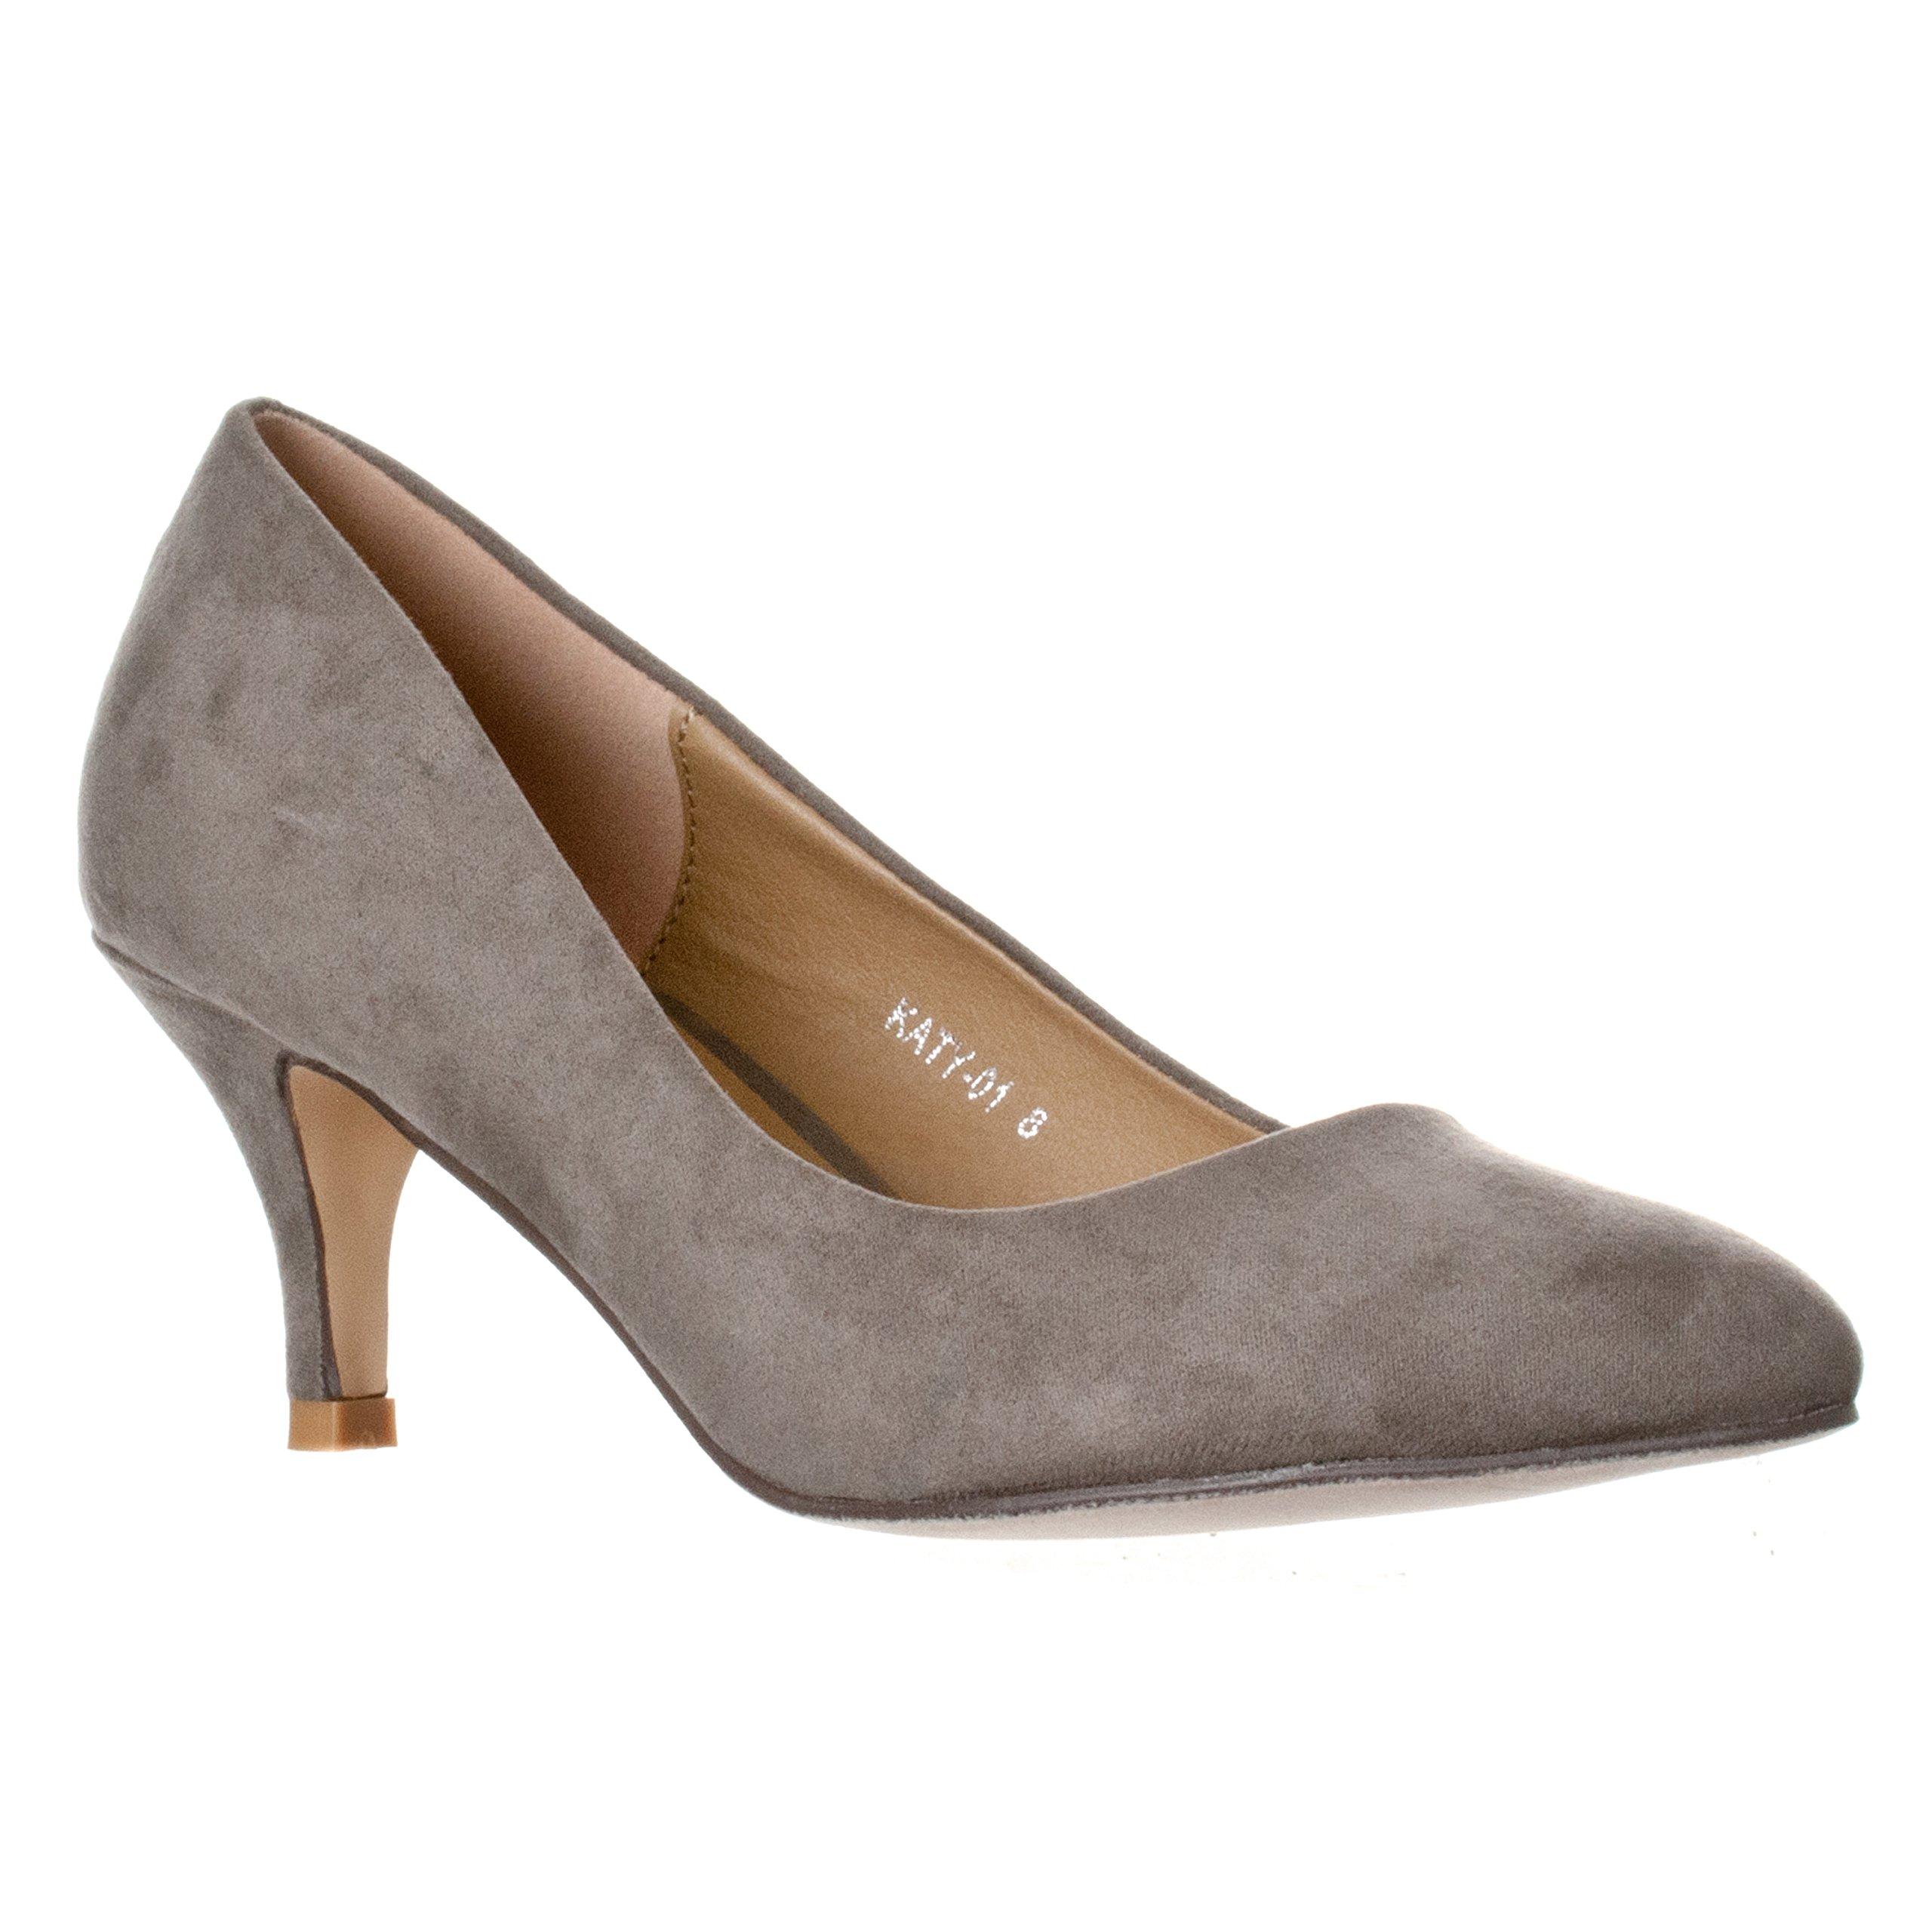 Riverberry Women's Katy Pointed, Closed Toe Low, Kitten Heel Pumps, Grey Suede, 7